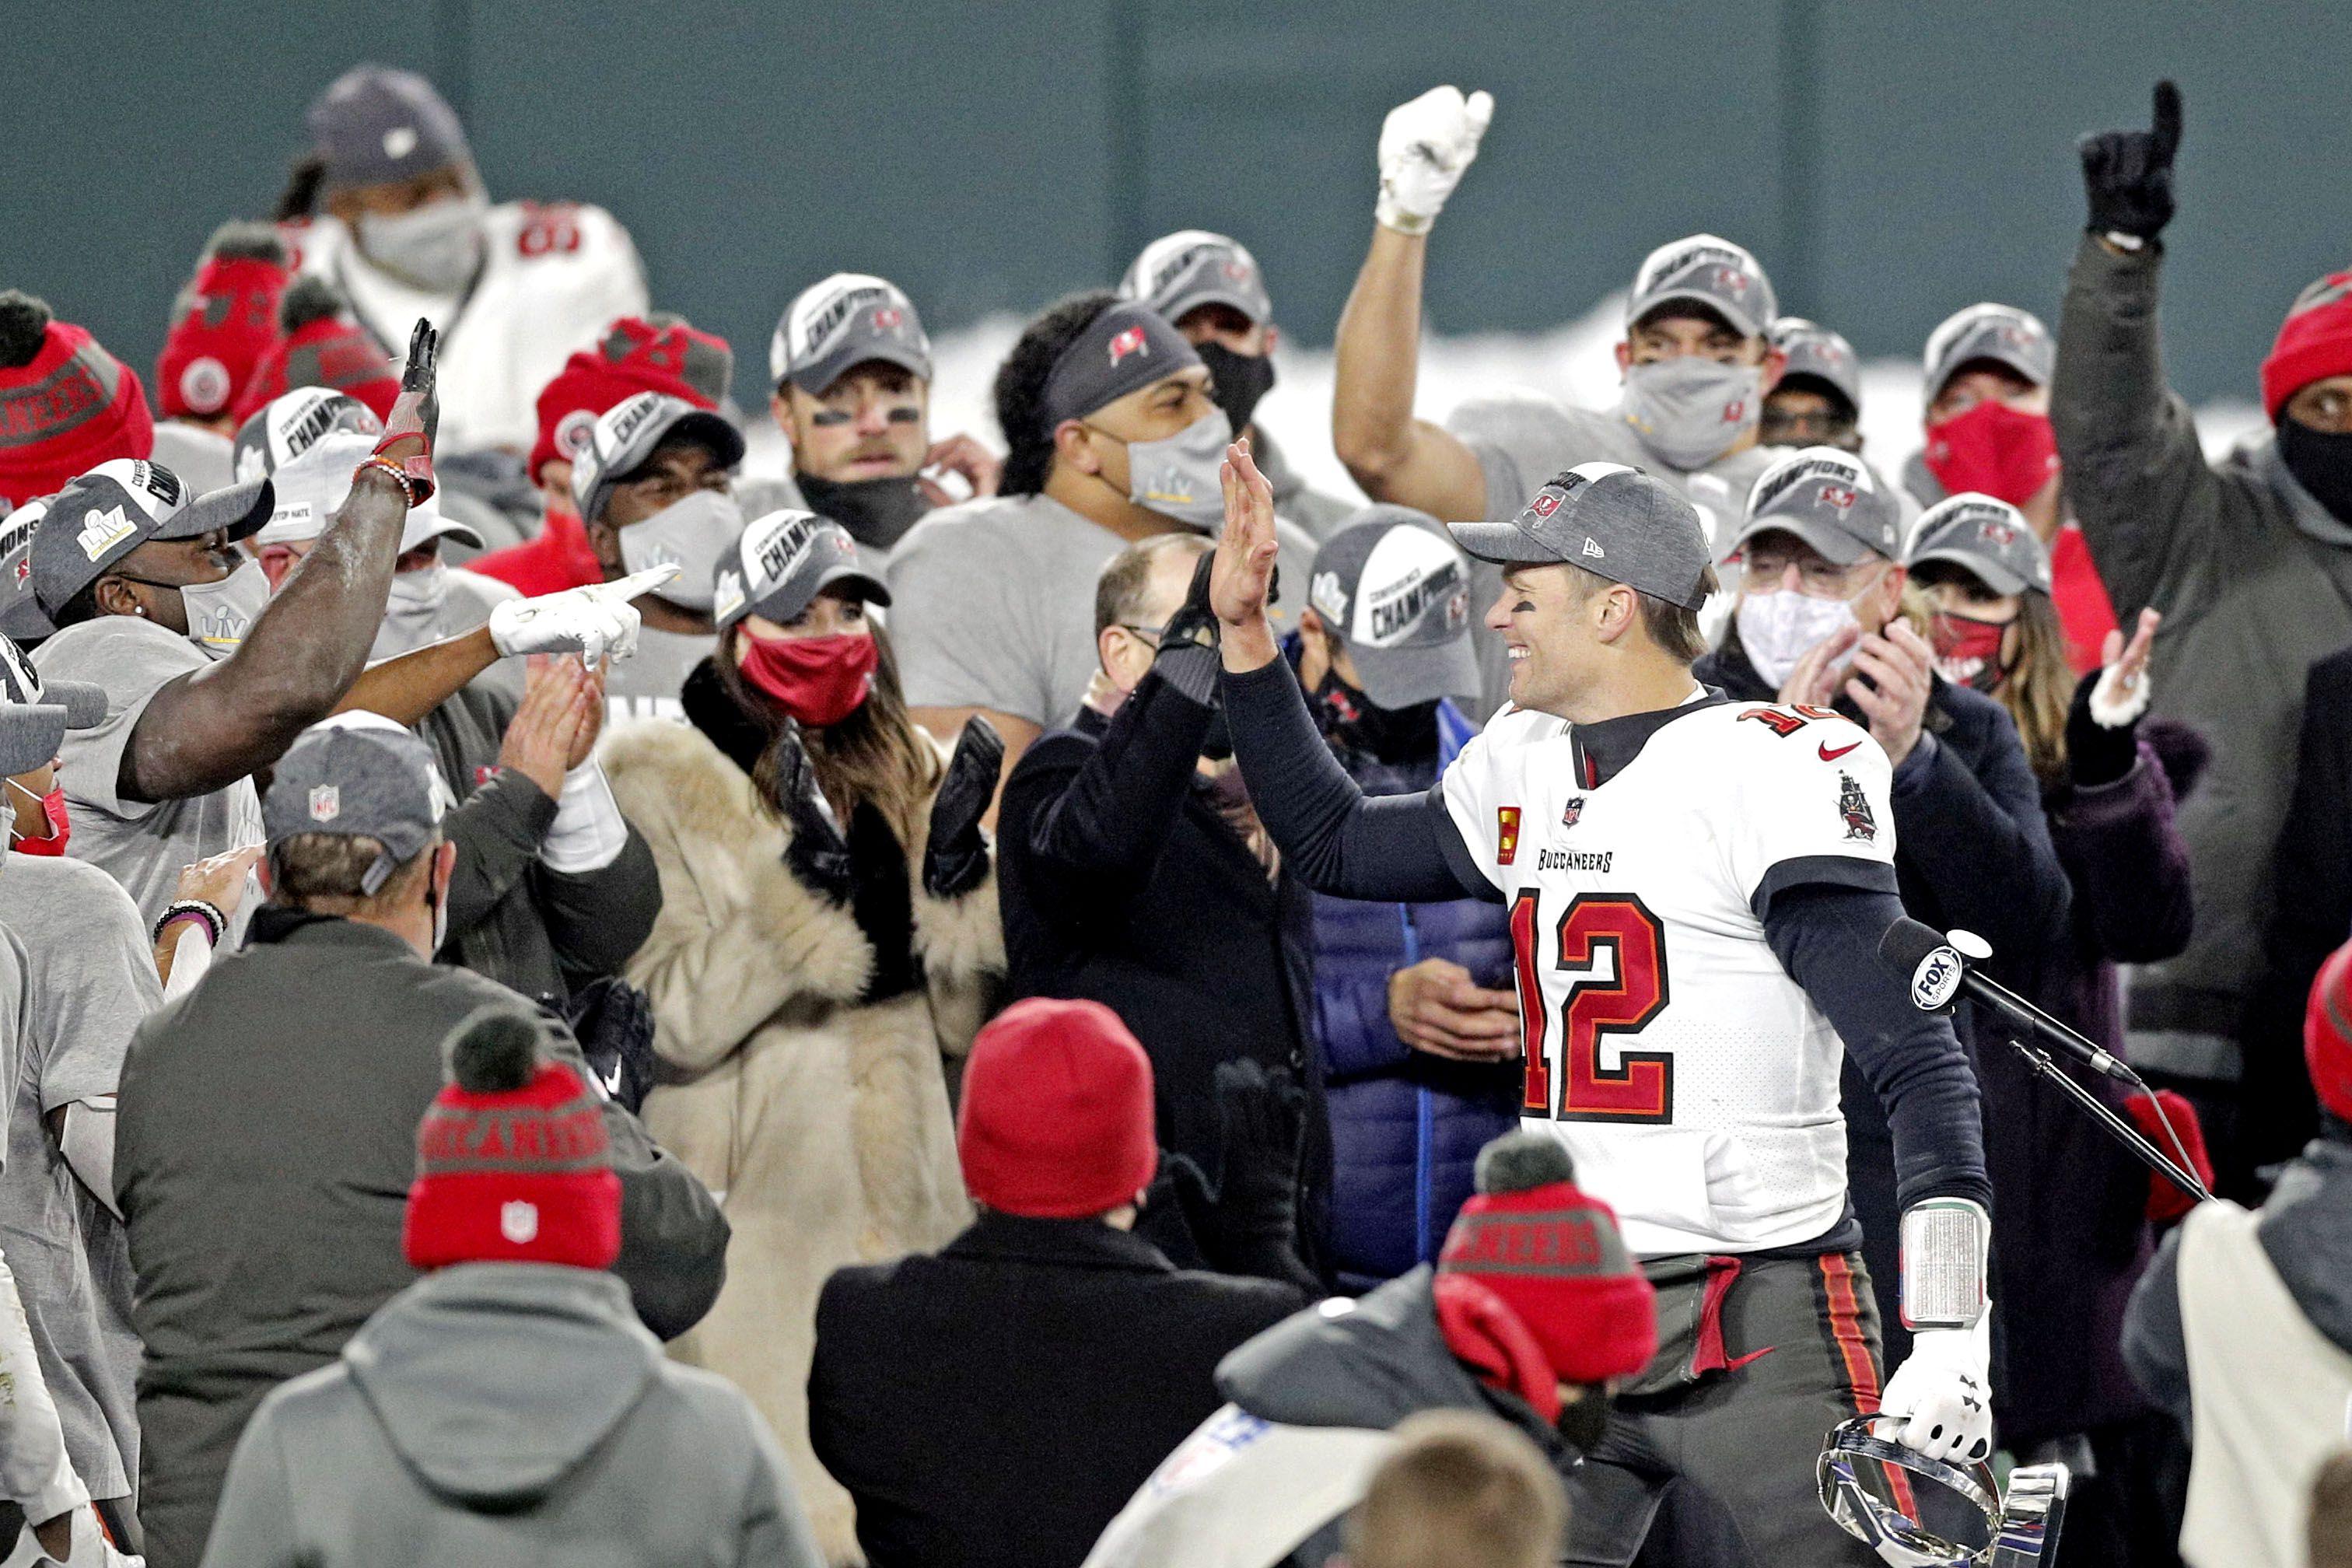 El quarterback de Tampa Bay Buccaneers, Tom Brady (12), celebra el triunfo ante Green Bay Packers que lo clasificó a la final del Super Bowl de la NFL (Mandatory Credit: Jeff Hanisch-USA TODAY Sports)